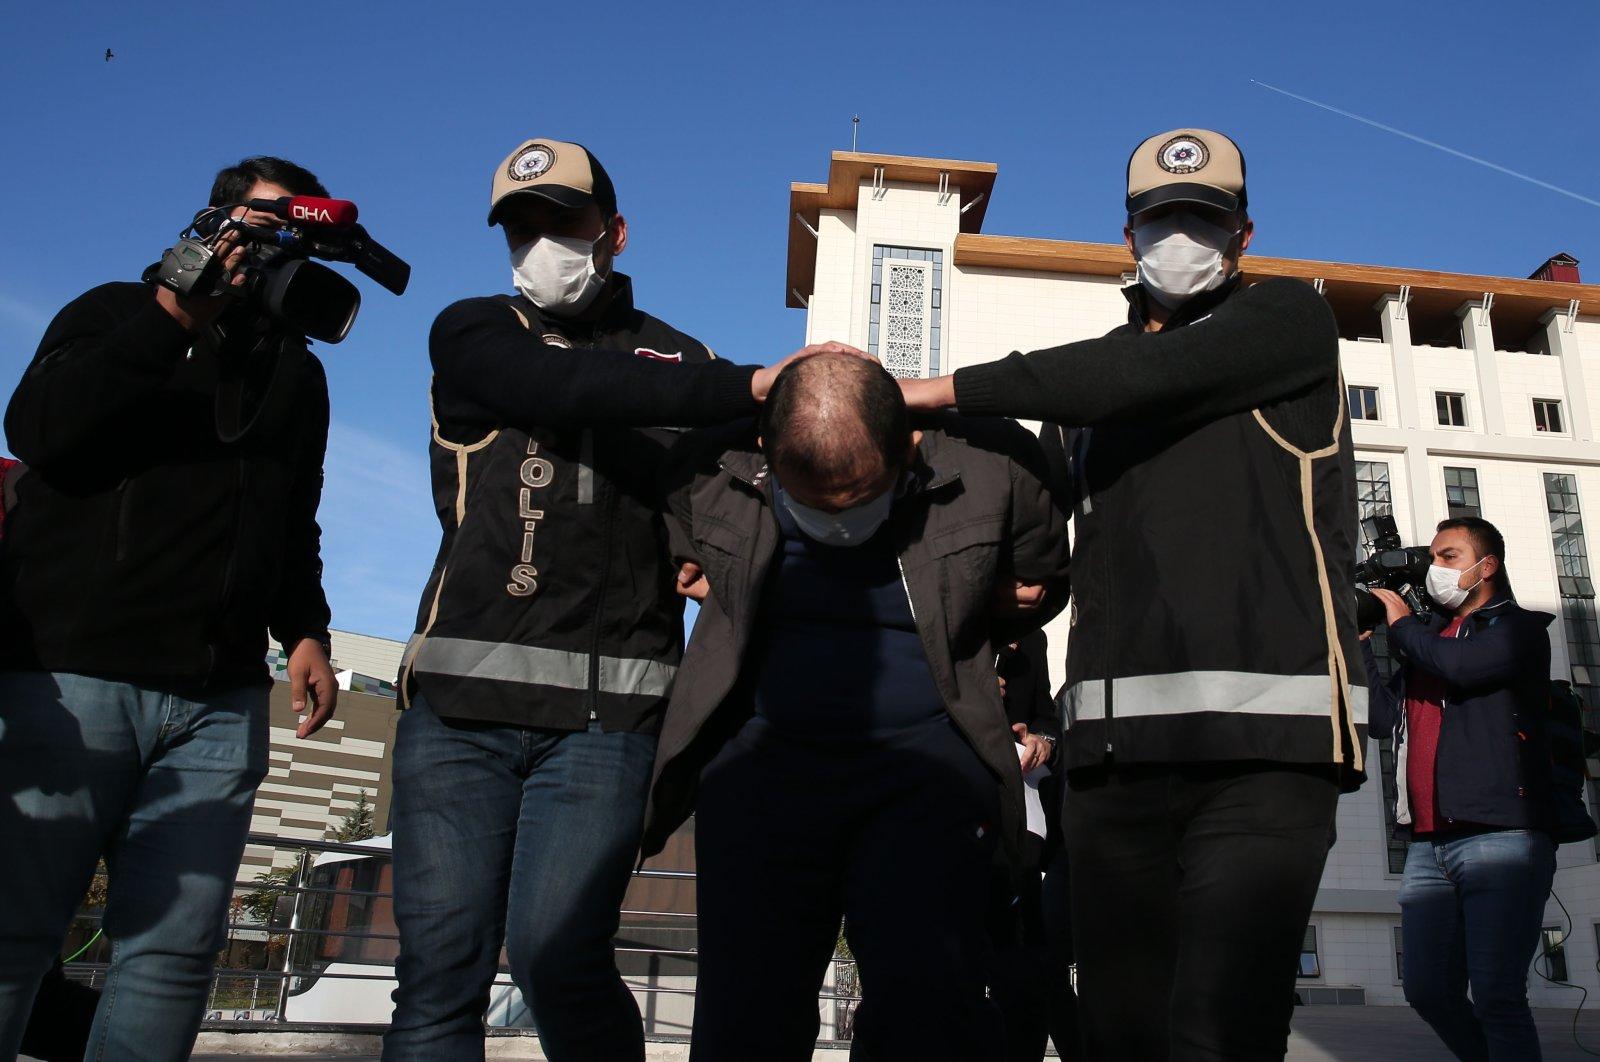 Police officers escort FETÖ suspect K. Y. M. following his capture, in Ankara, on Nov. 7, 2020. (AA Photo)